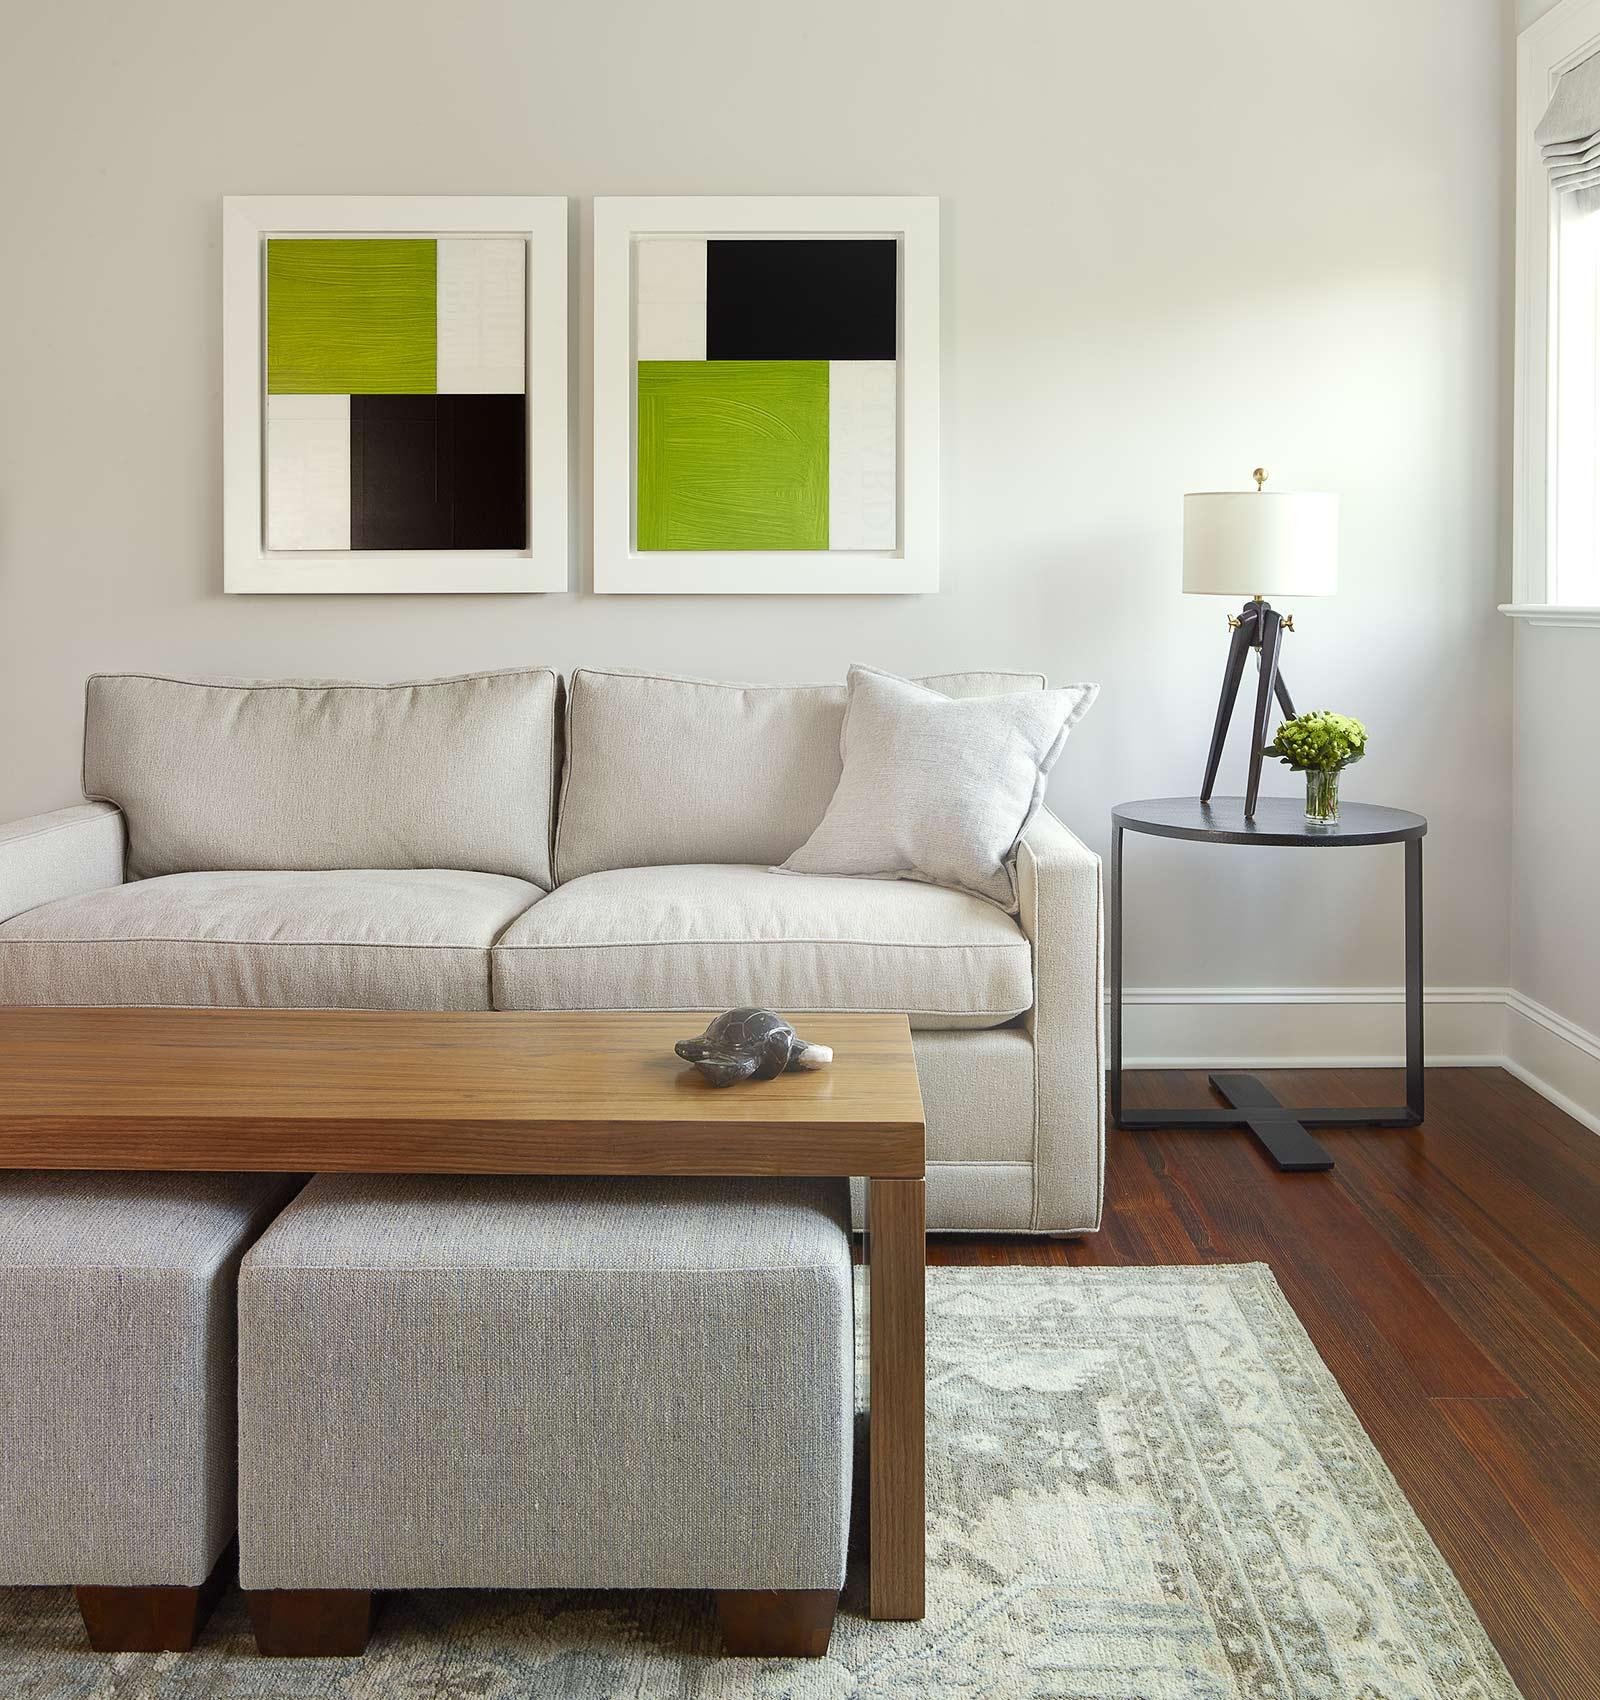 Modern vs contemporary design margaret donaldson 2015 for Modern vs contemporary interior design